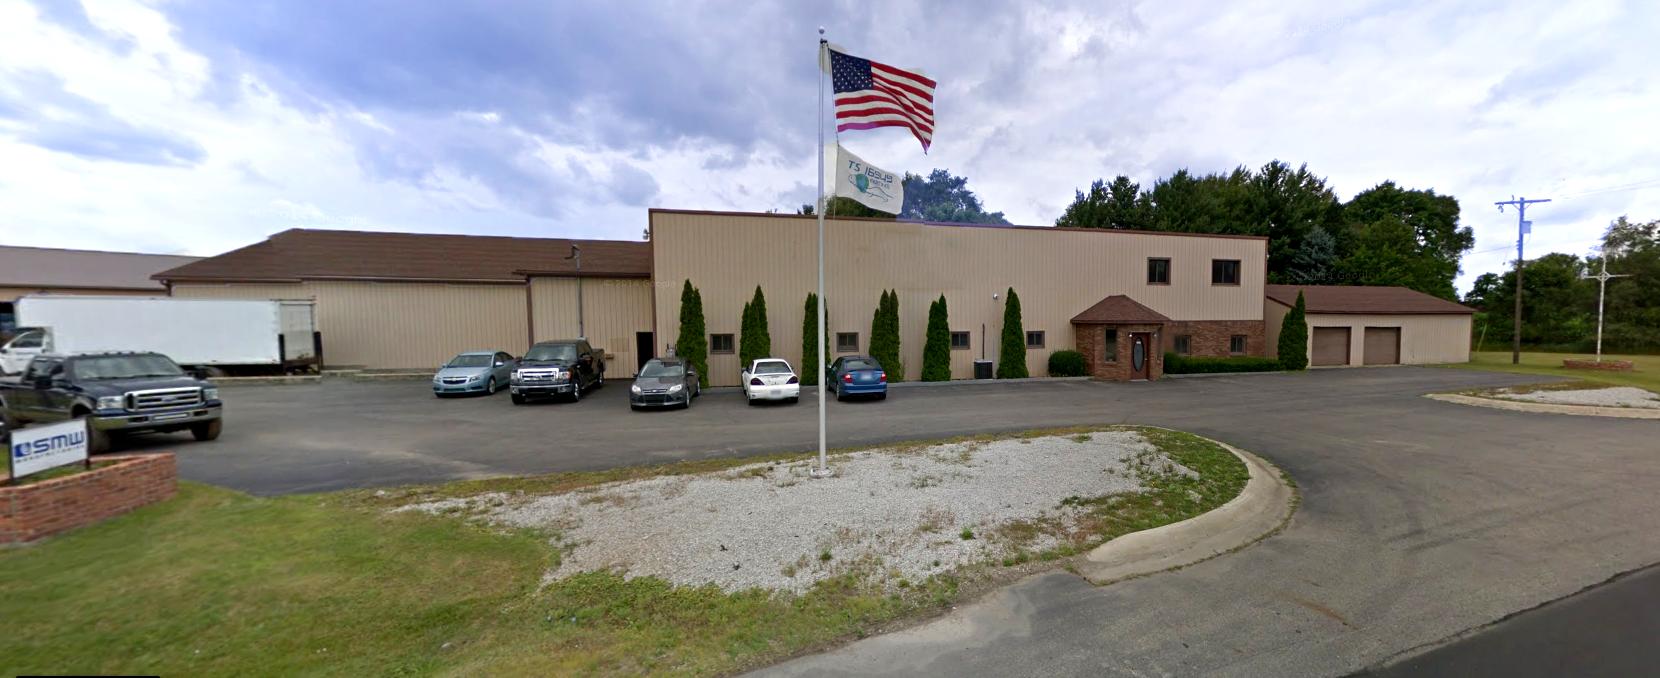 Munith, Michigan - 31,000 sq. ft.Cold Form Facility